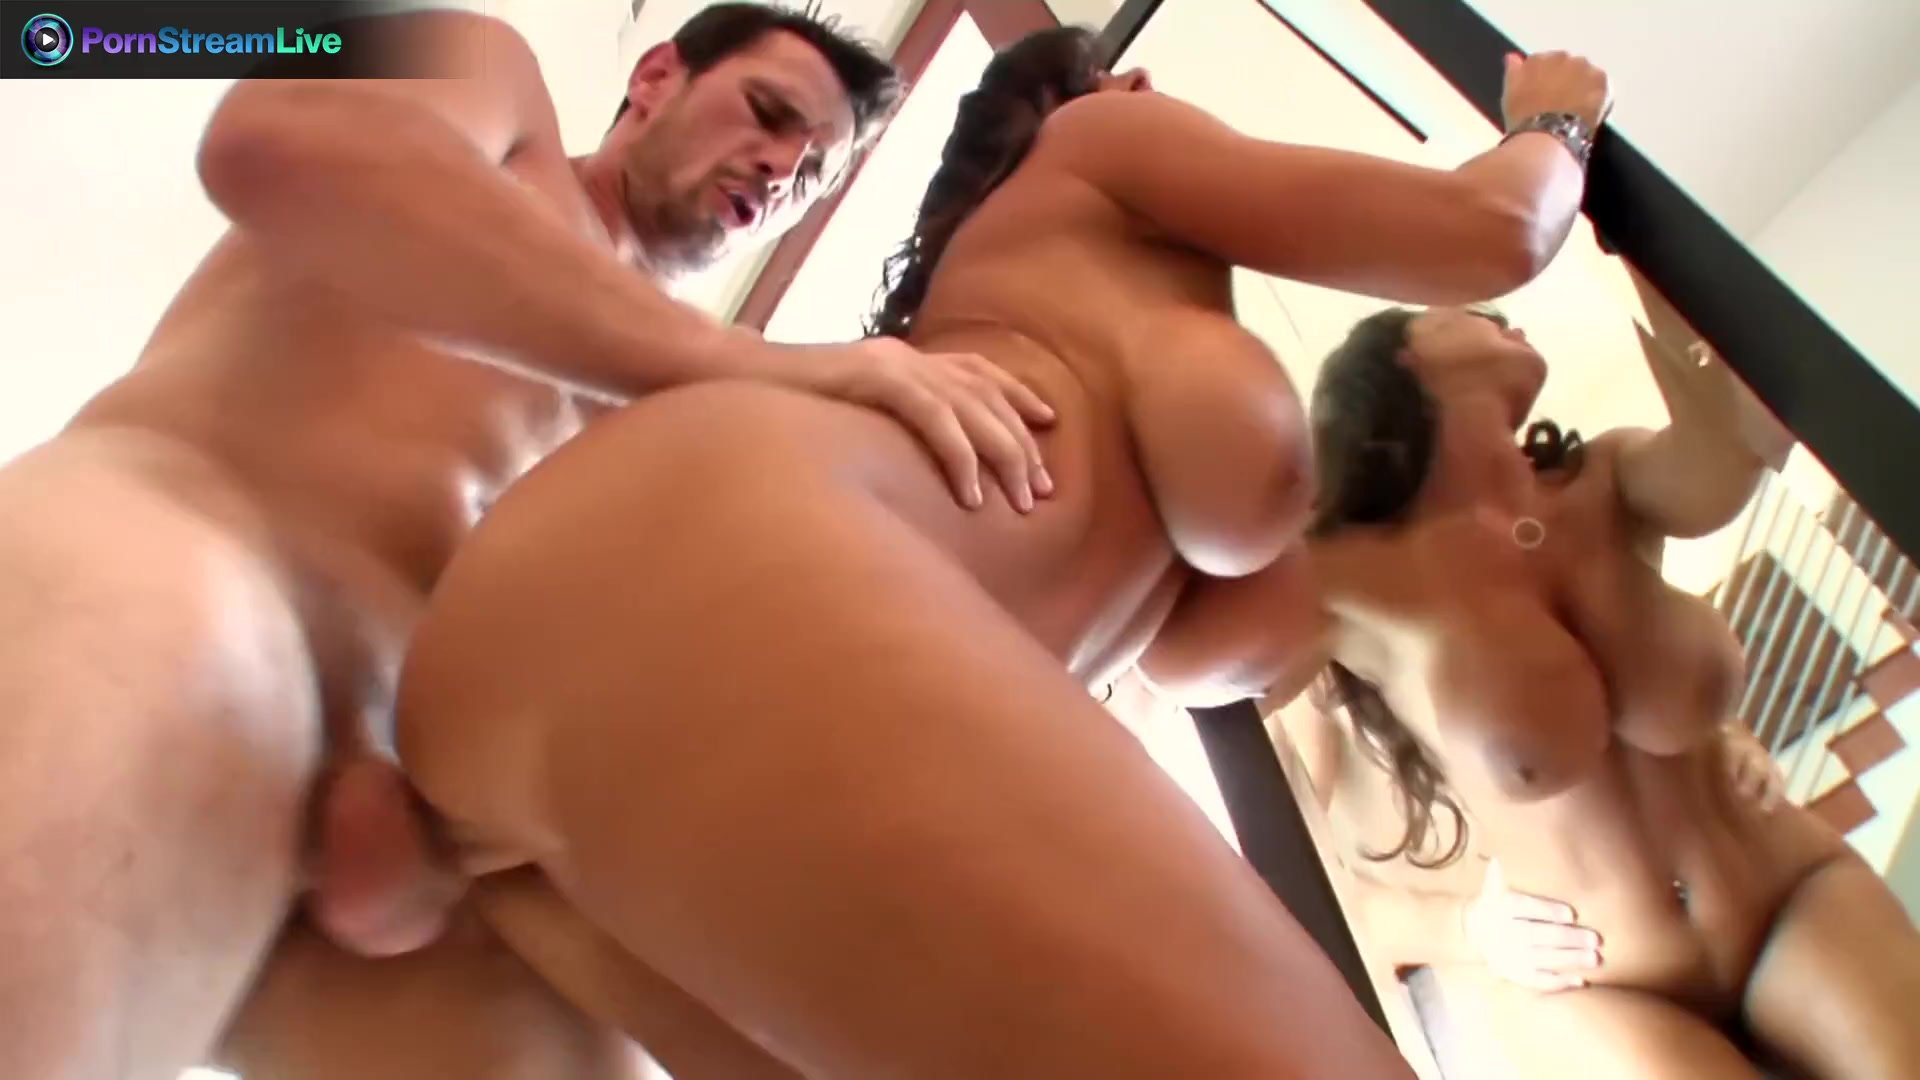 Lisa Ann wild sex with Manuel Ferrara